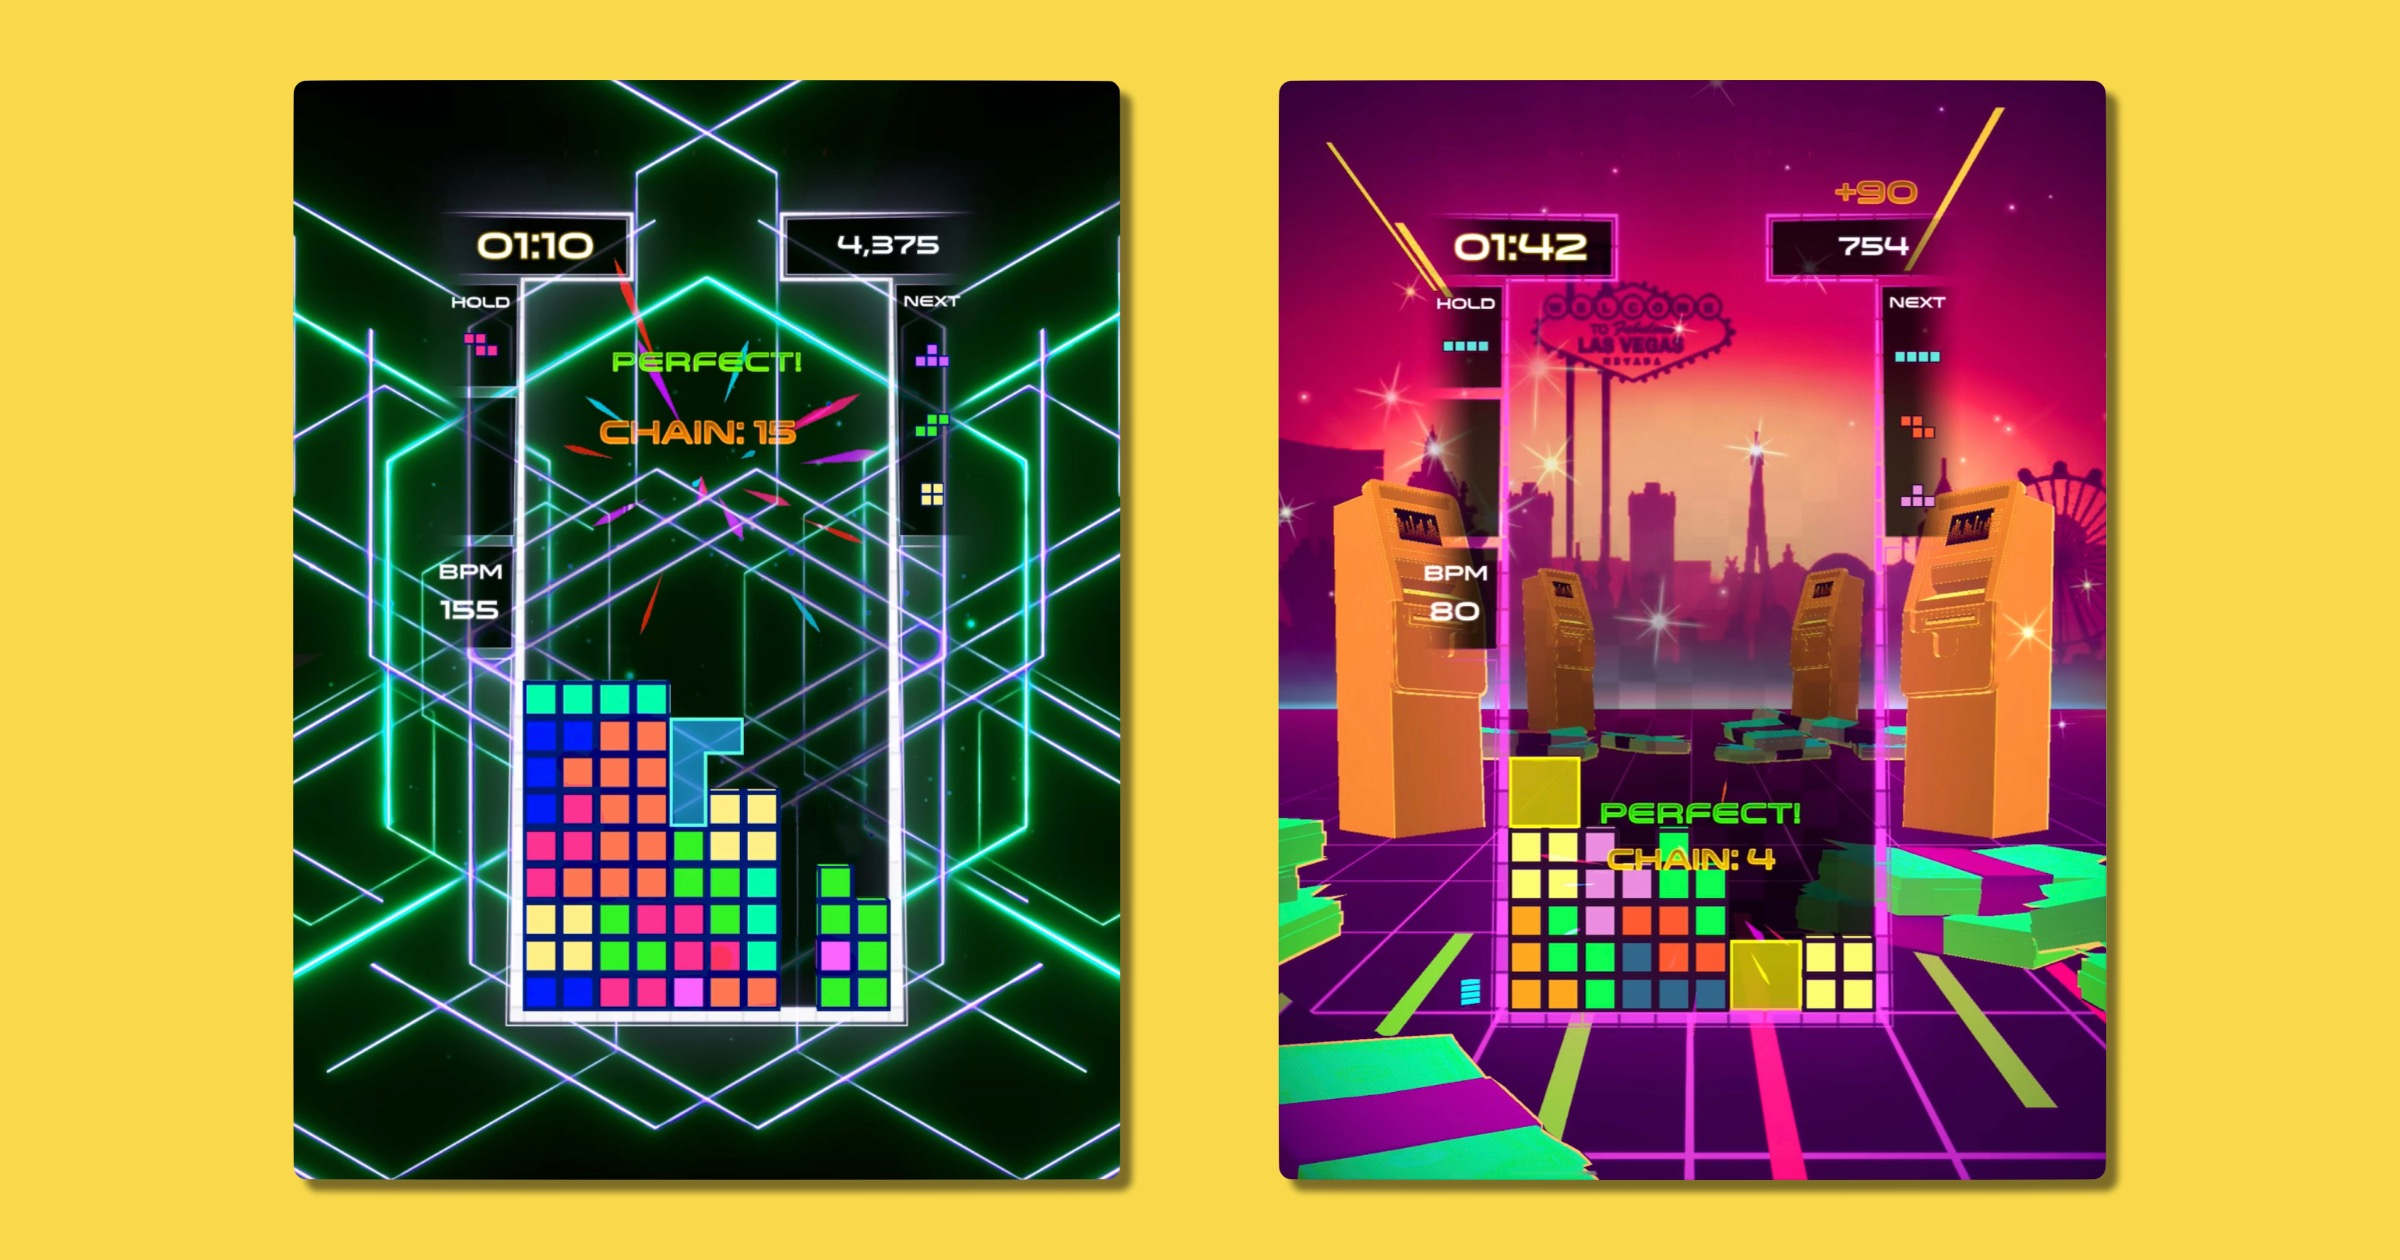 Musical Puzzle Game 'Tetris Beat' Arrives on Apple Arcade